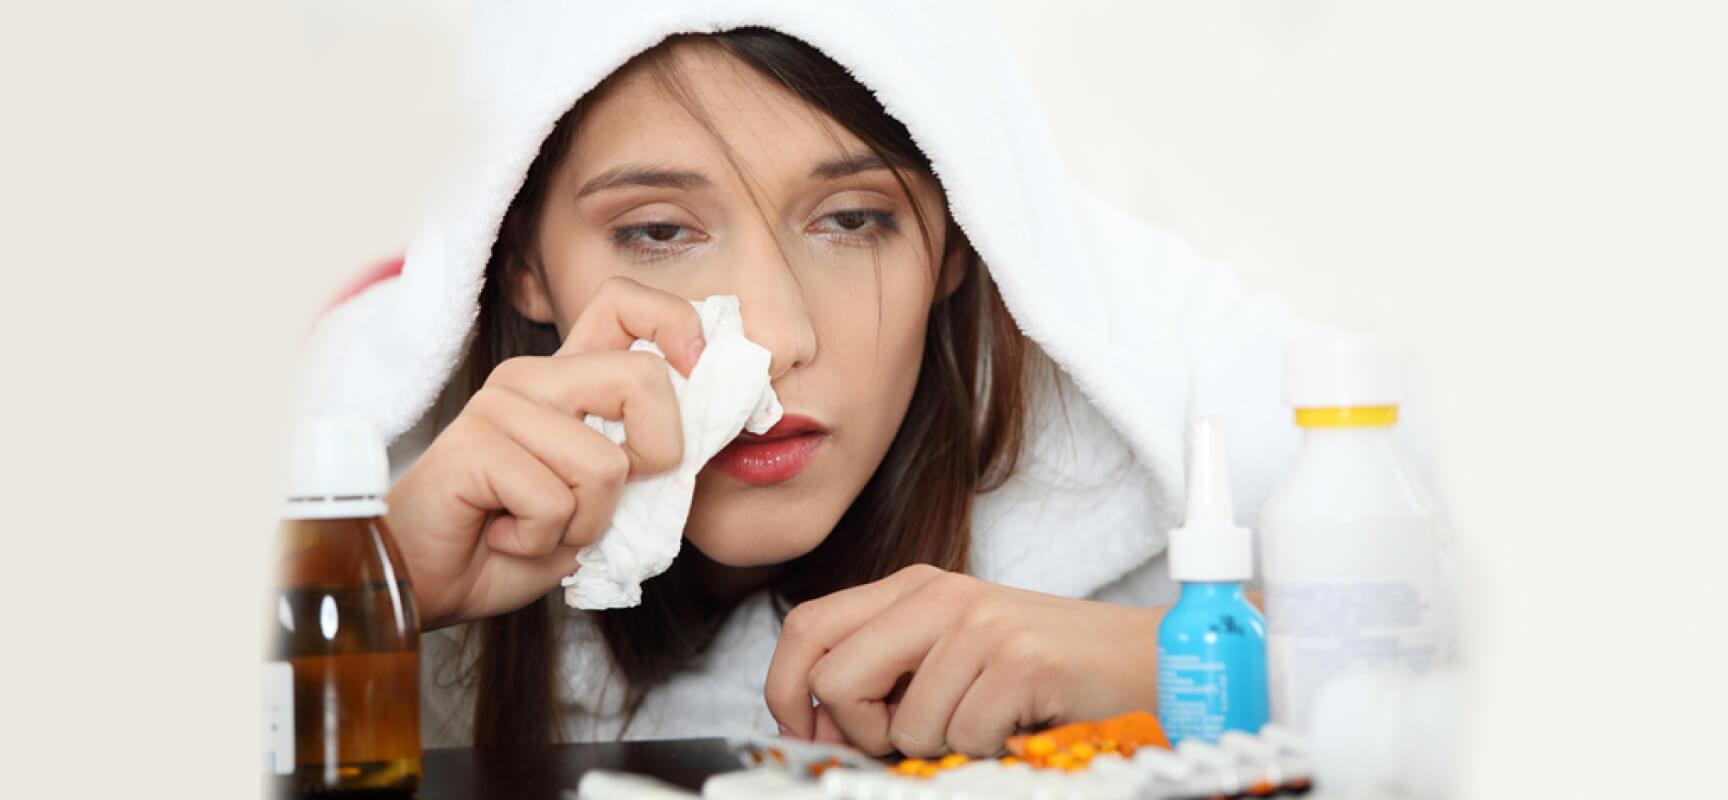 эффективное средство от аллергии на солнце